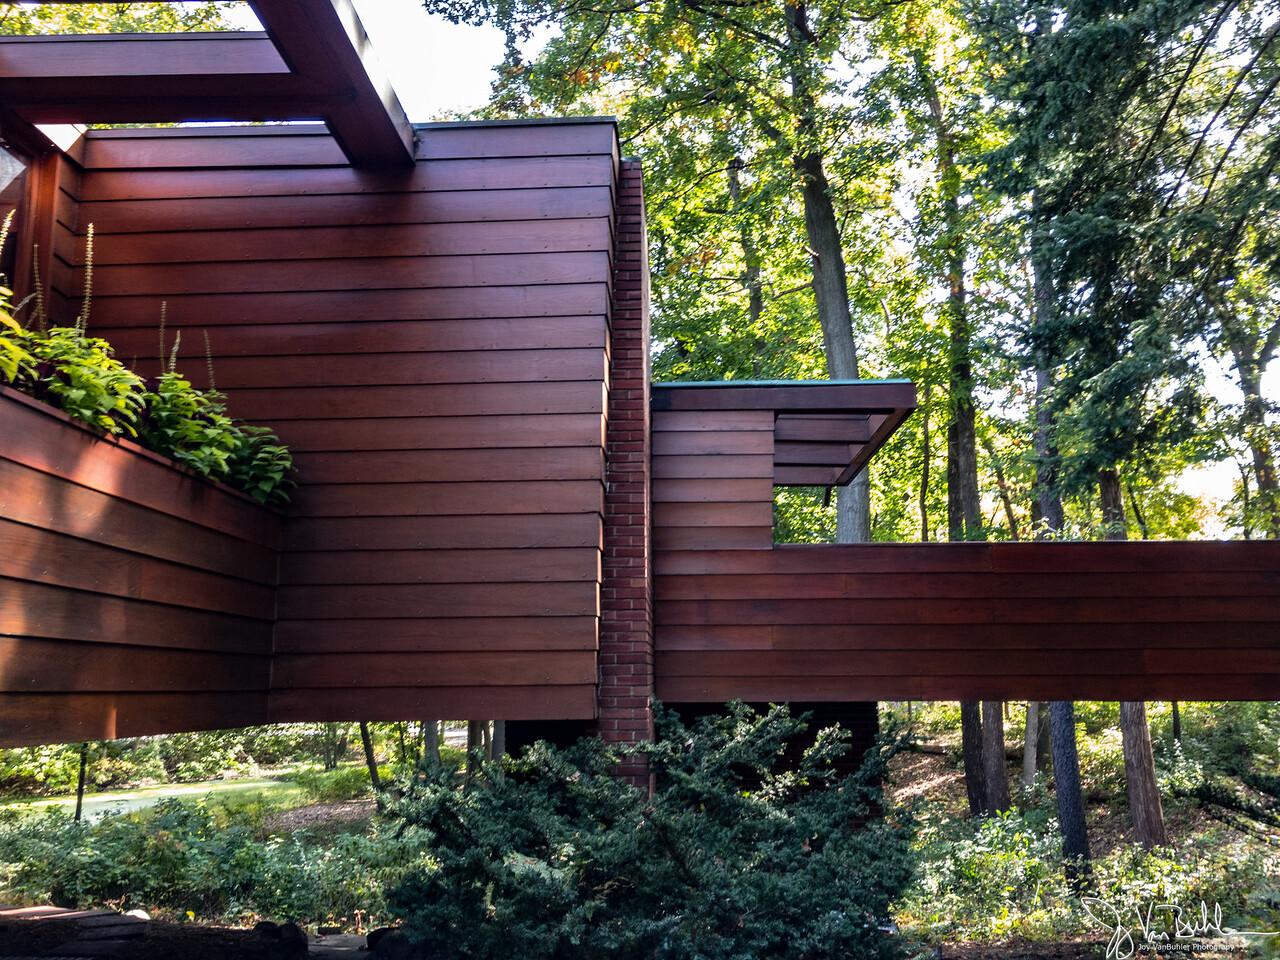 42/52-3: Frank Lloyd Wright Affleck House